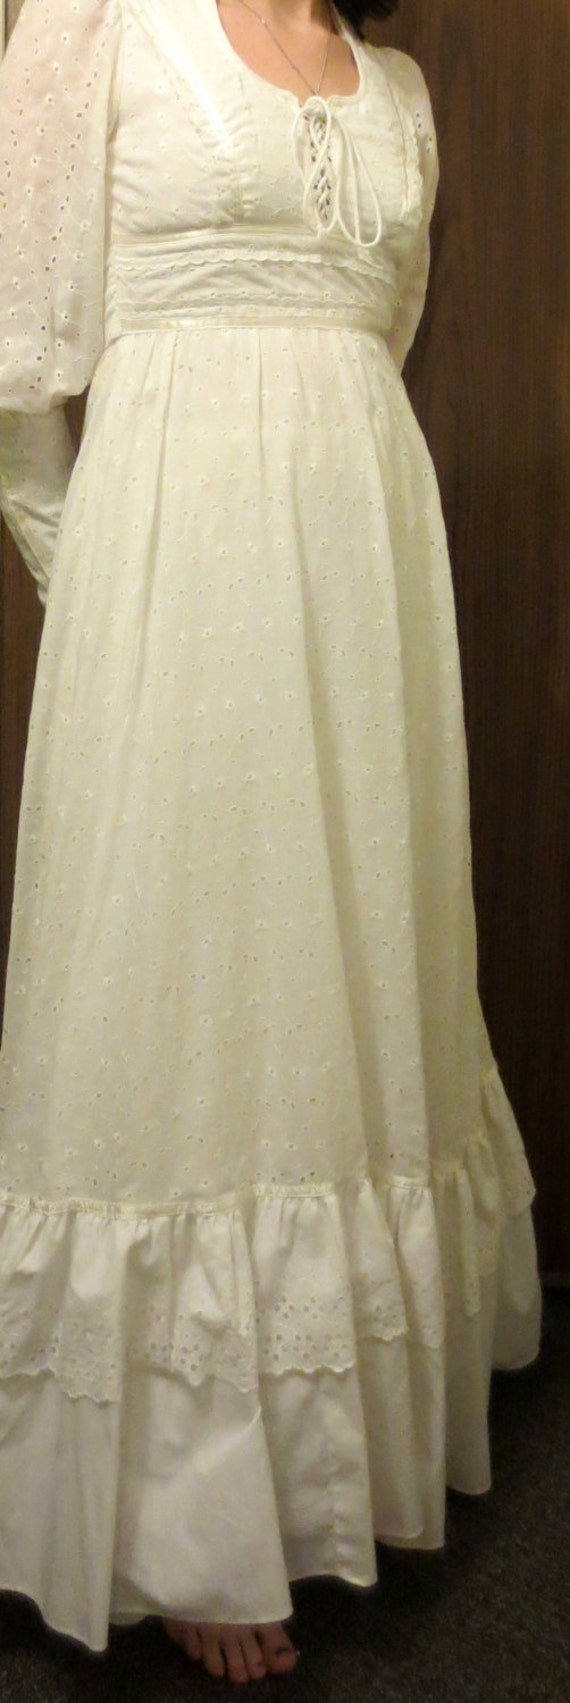 Vintage gunne sax by jessica san francisco by for Vintage wedding dresses san diego